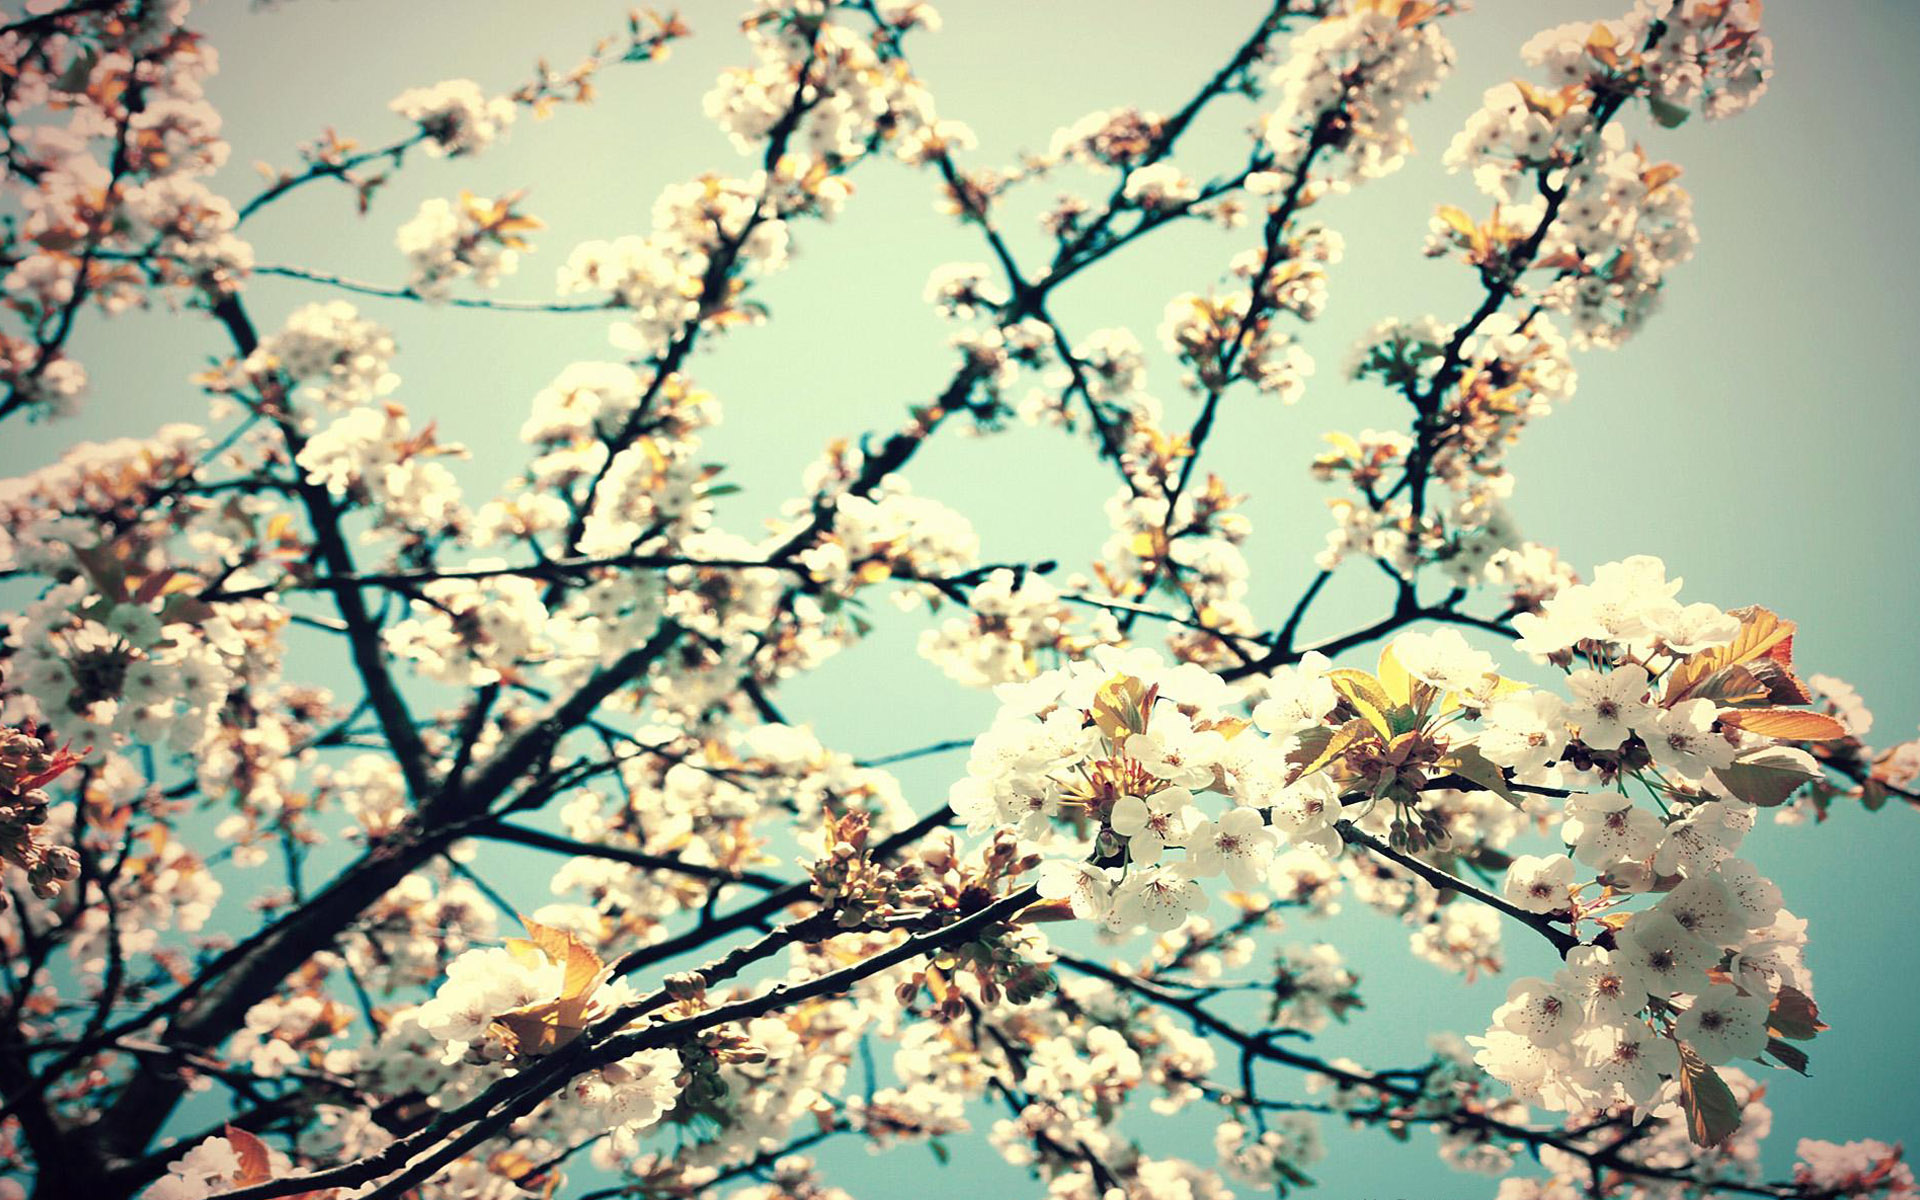 Blossom Hd Wallpaper Background Image 1920x1200 Id 89328